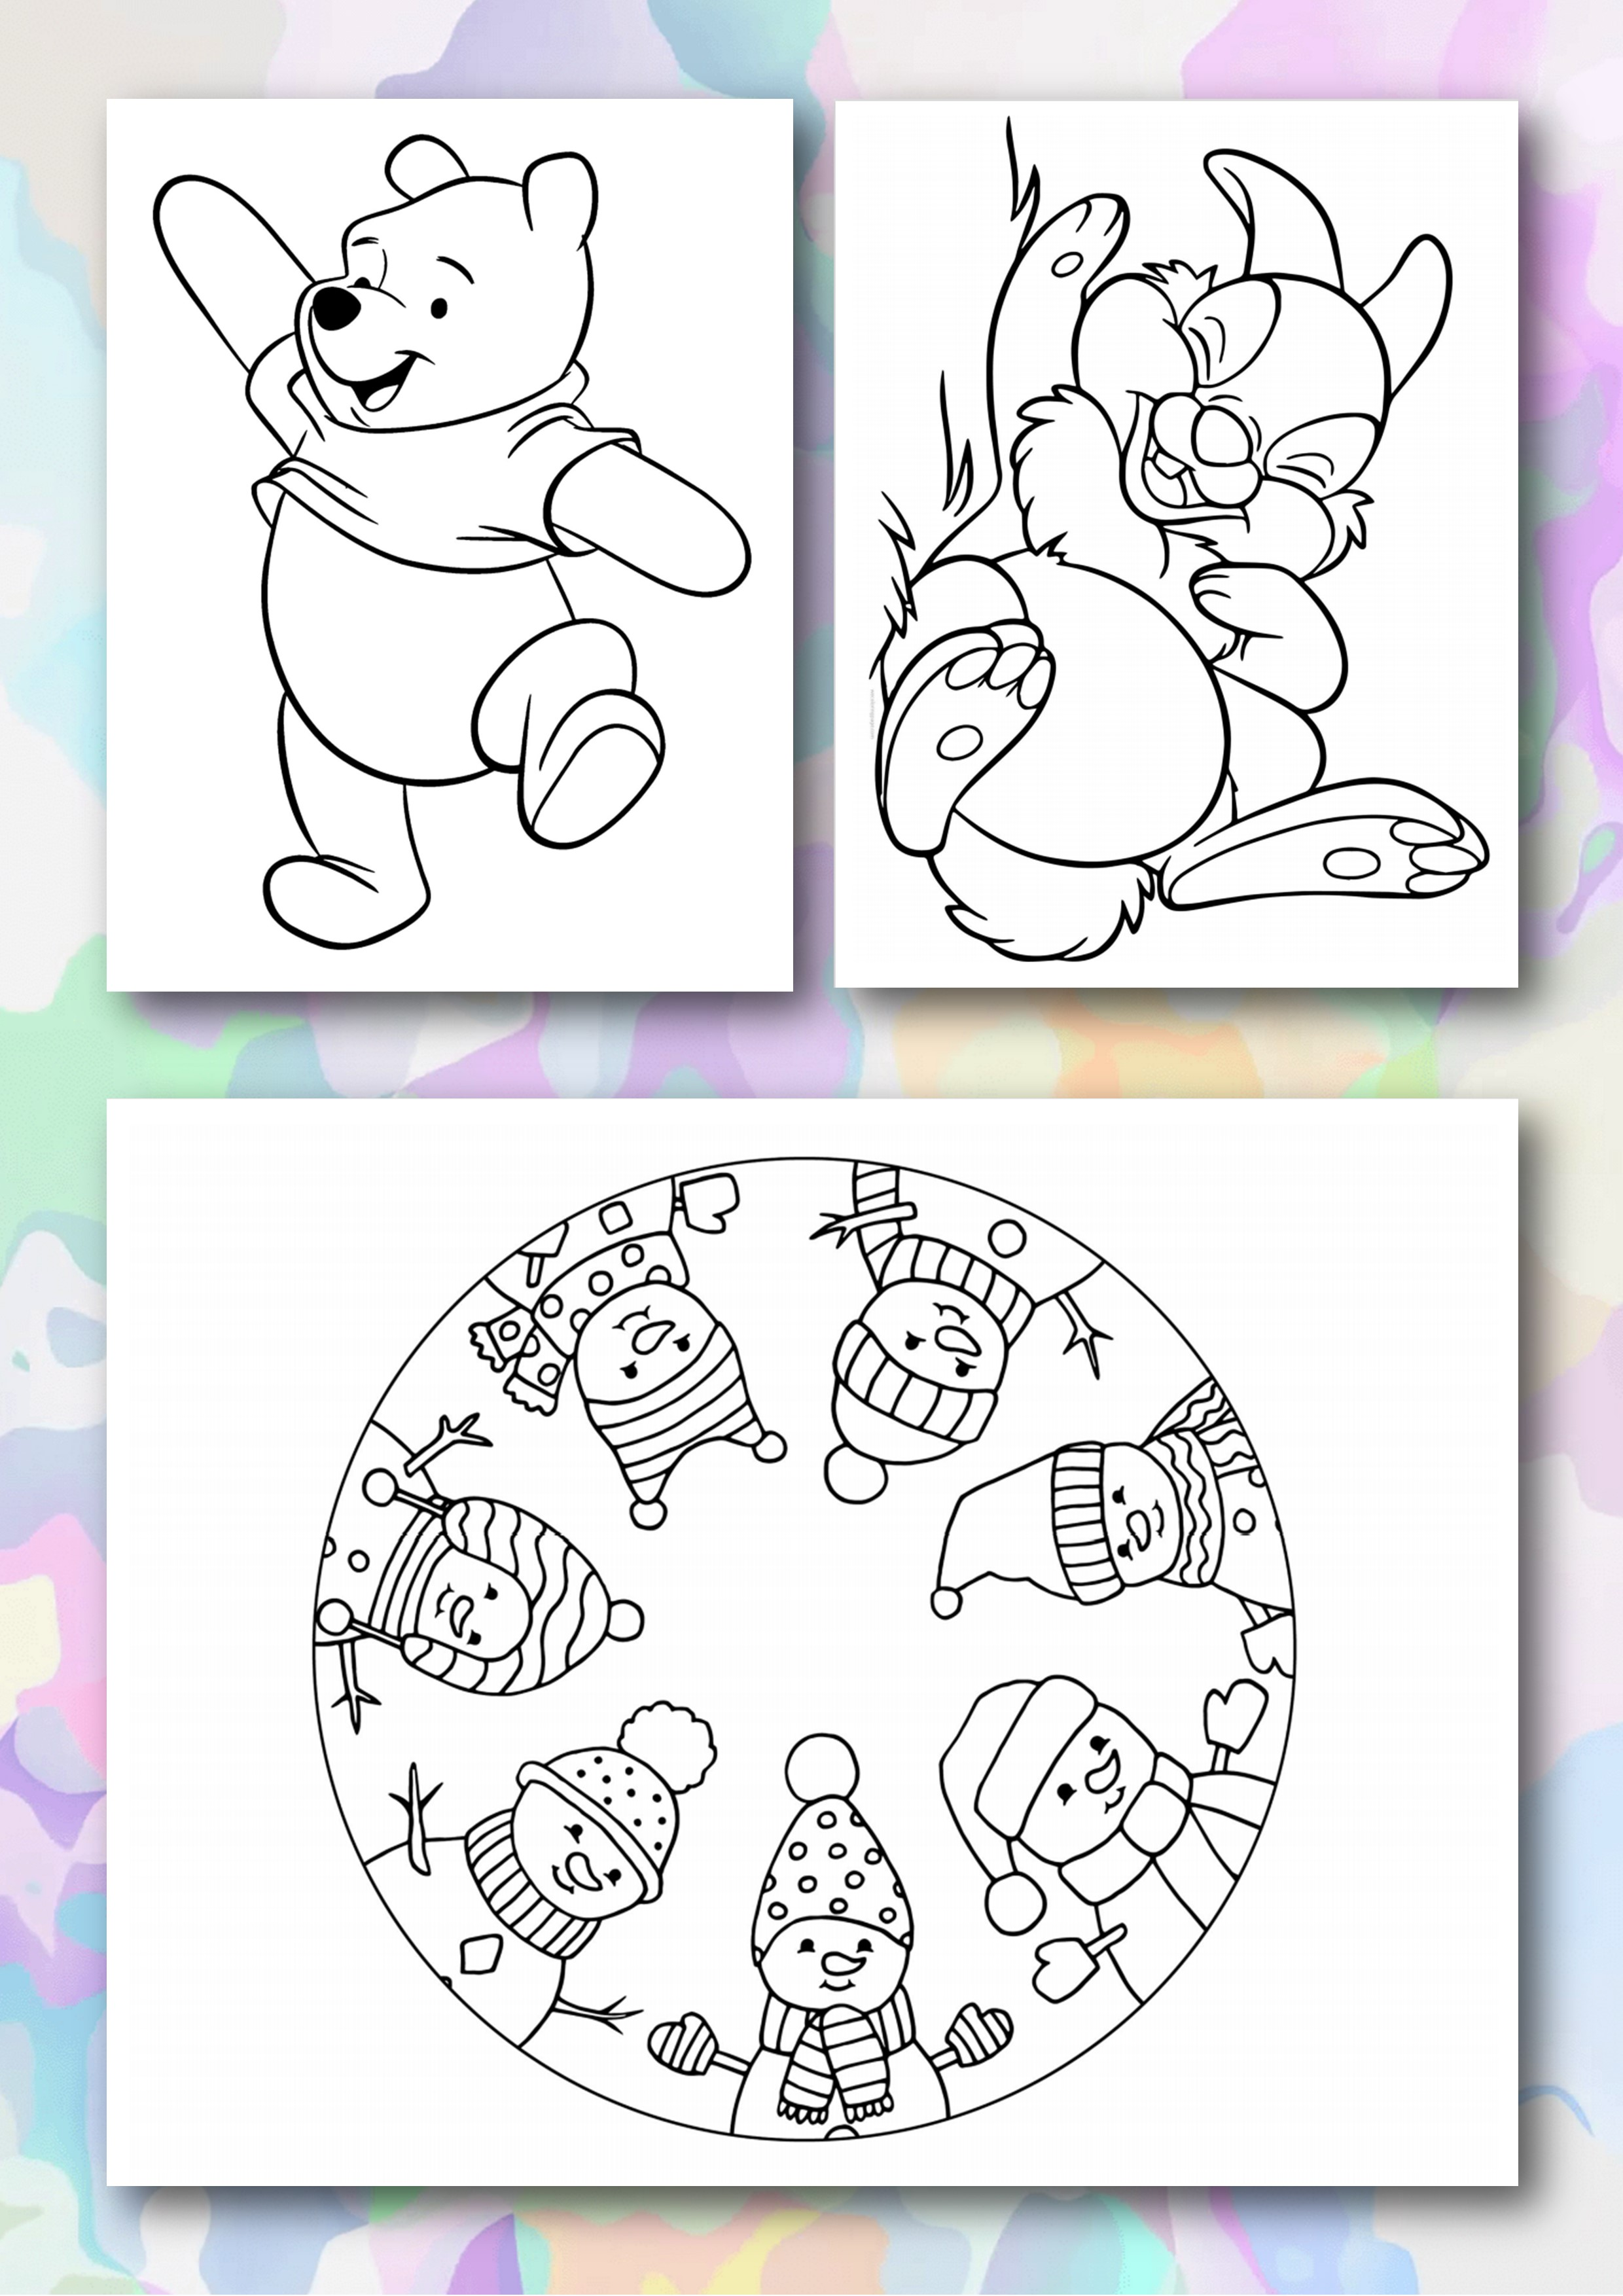 Coloring Books for Children/PDF/Digital Download/Printable